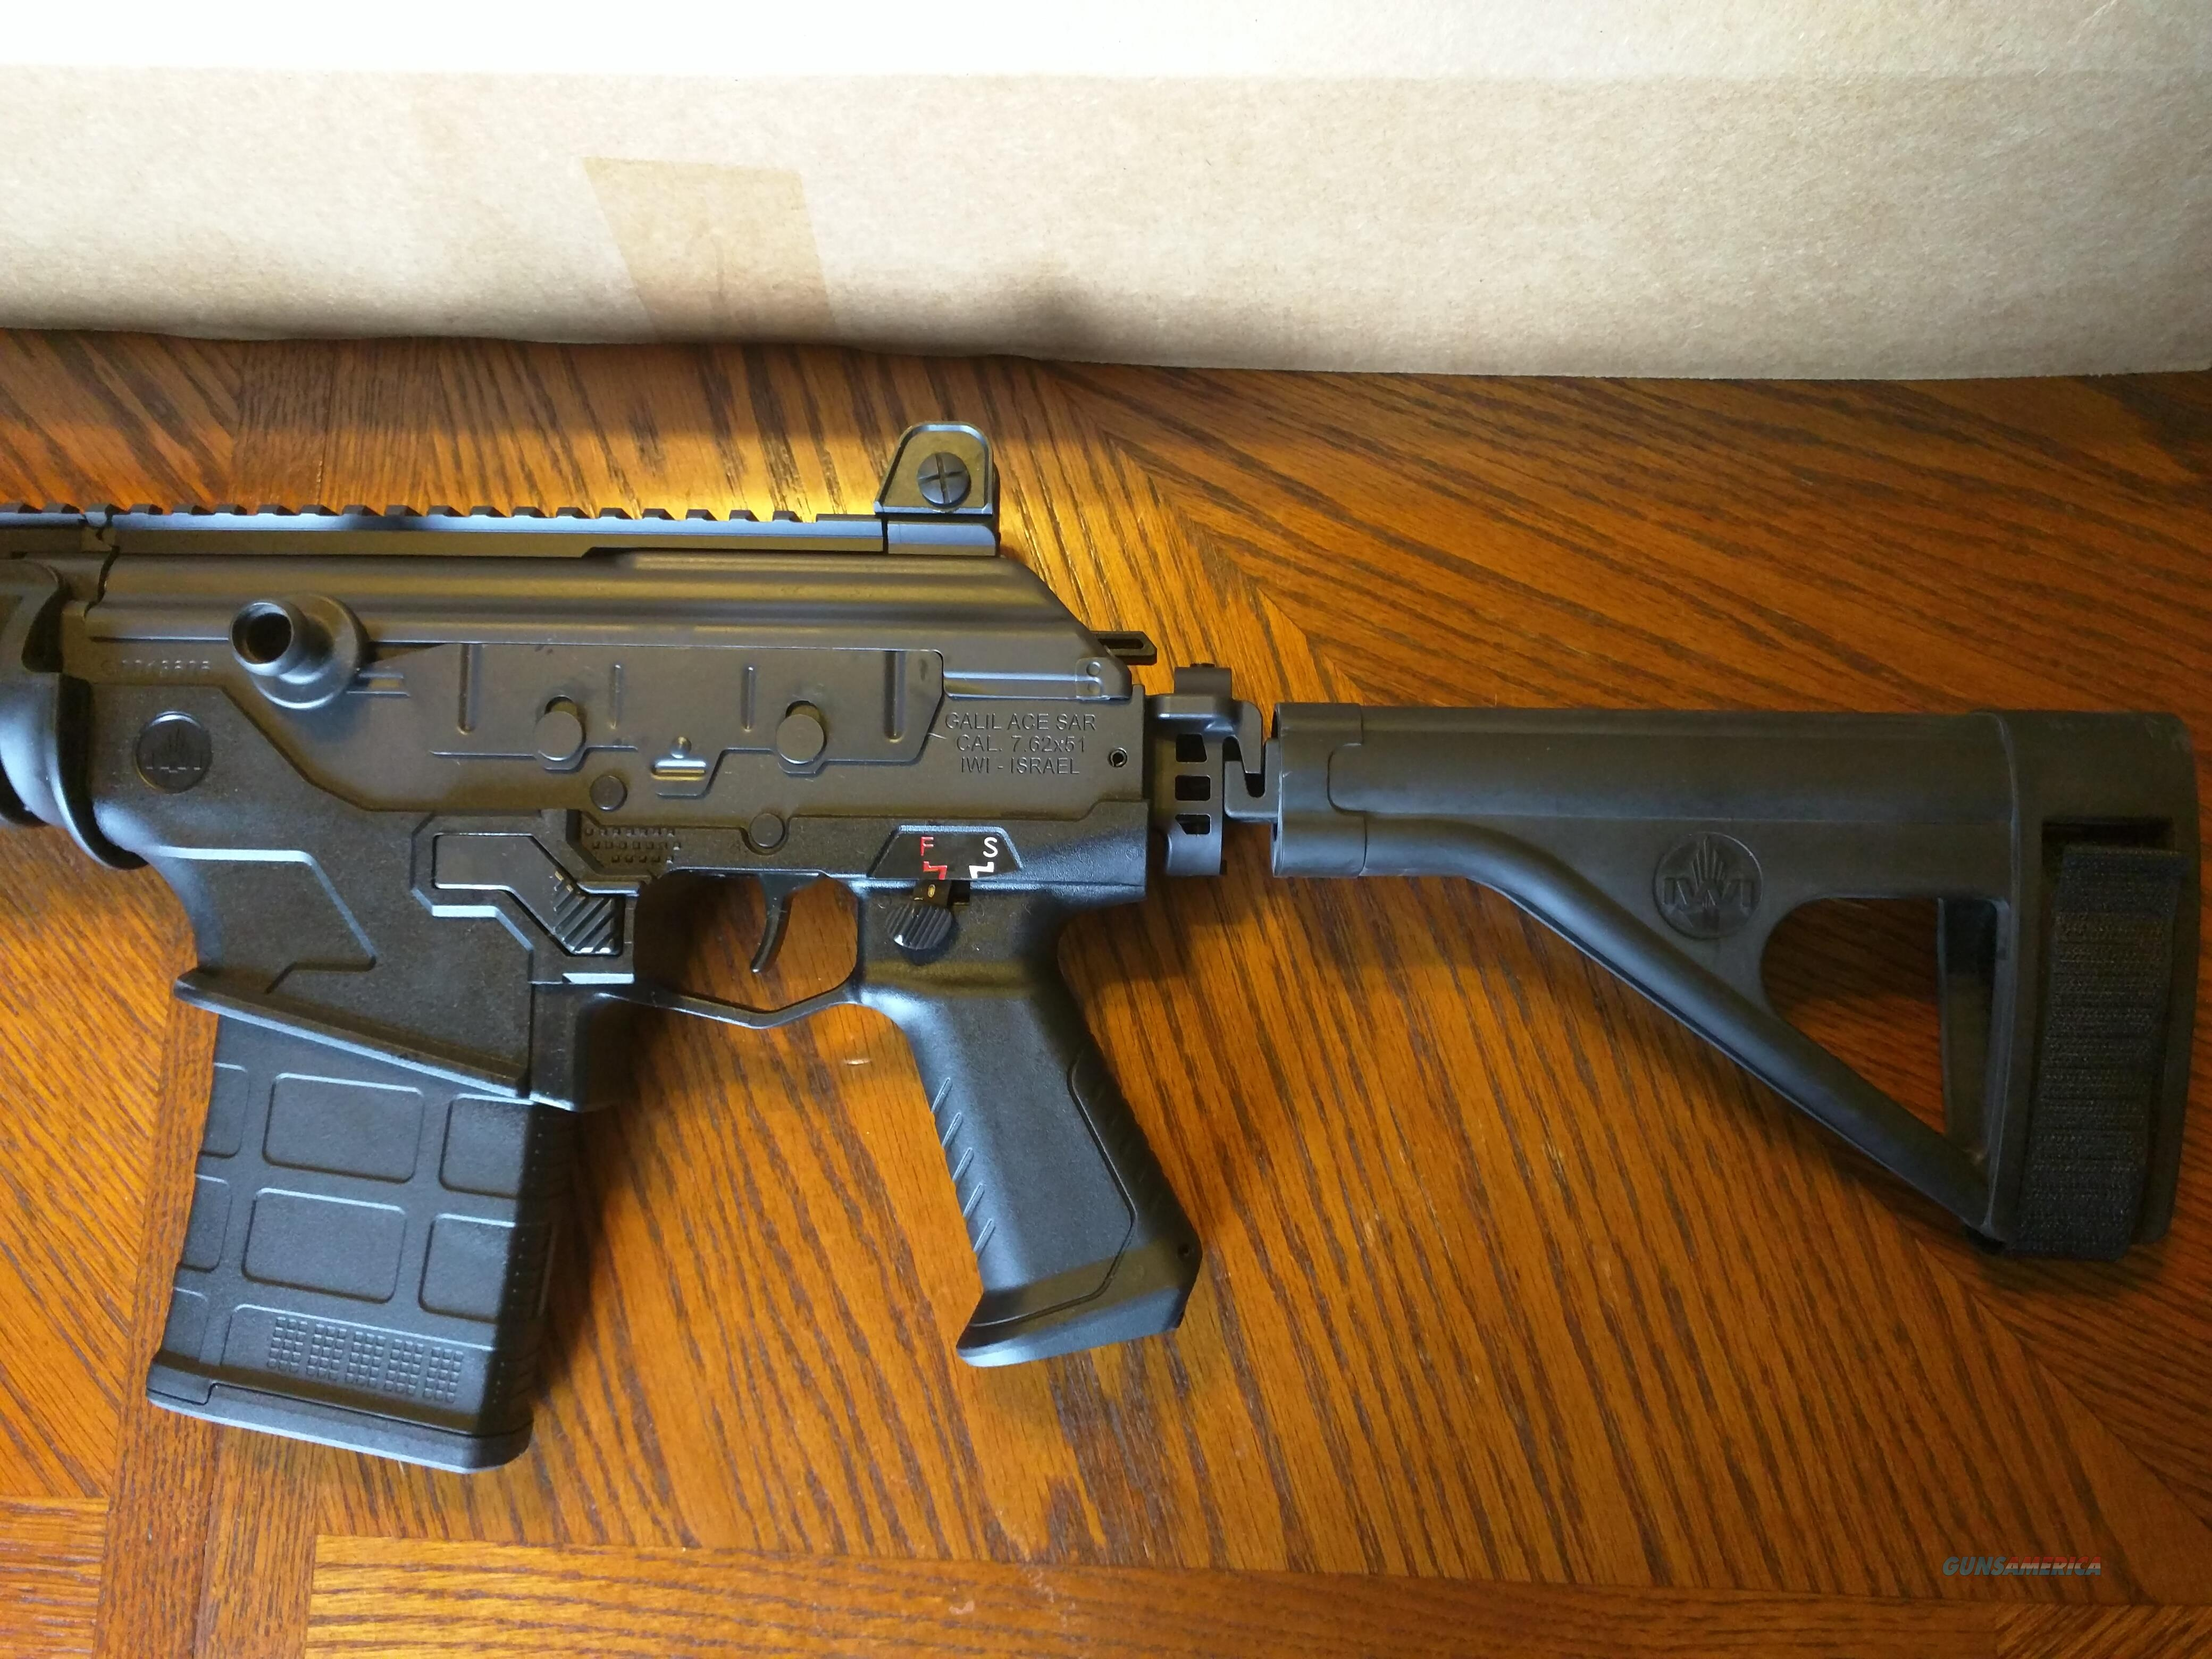 IWI Galil Ace Pistol 7 62x51 Nato 308 NIB 11 8